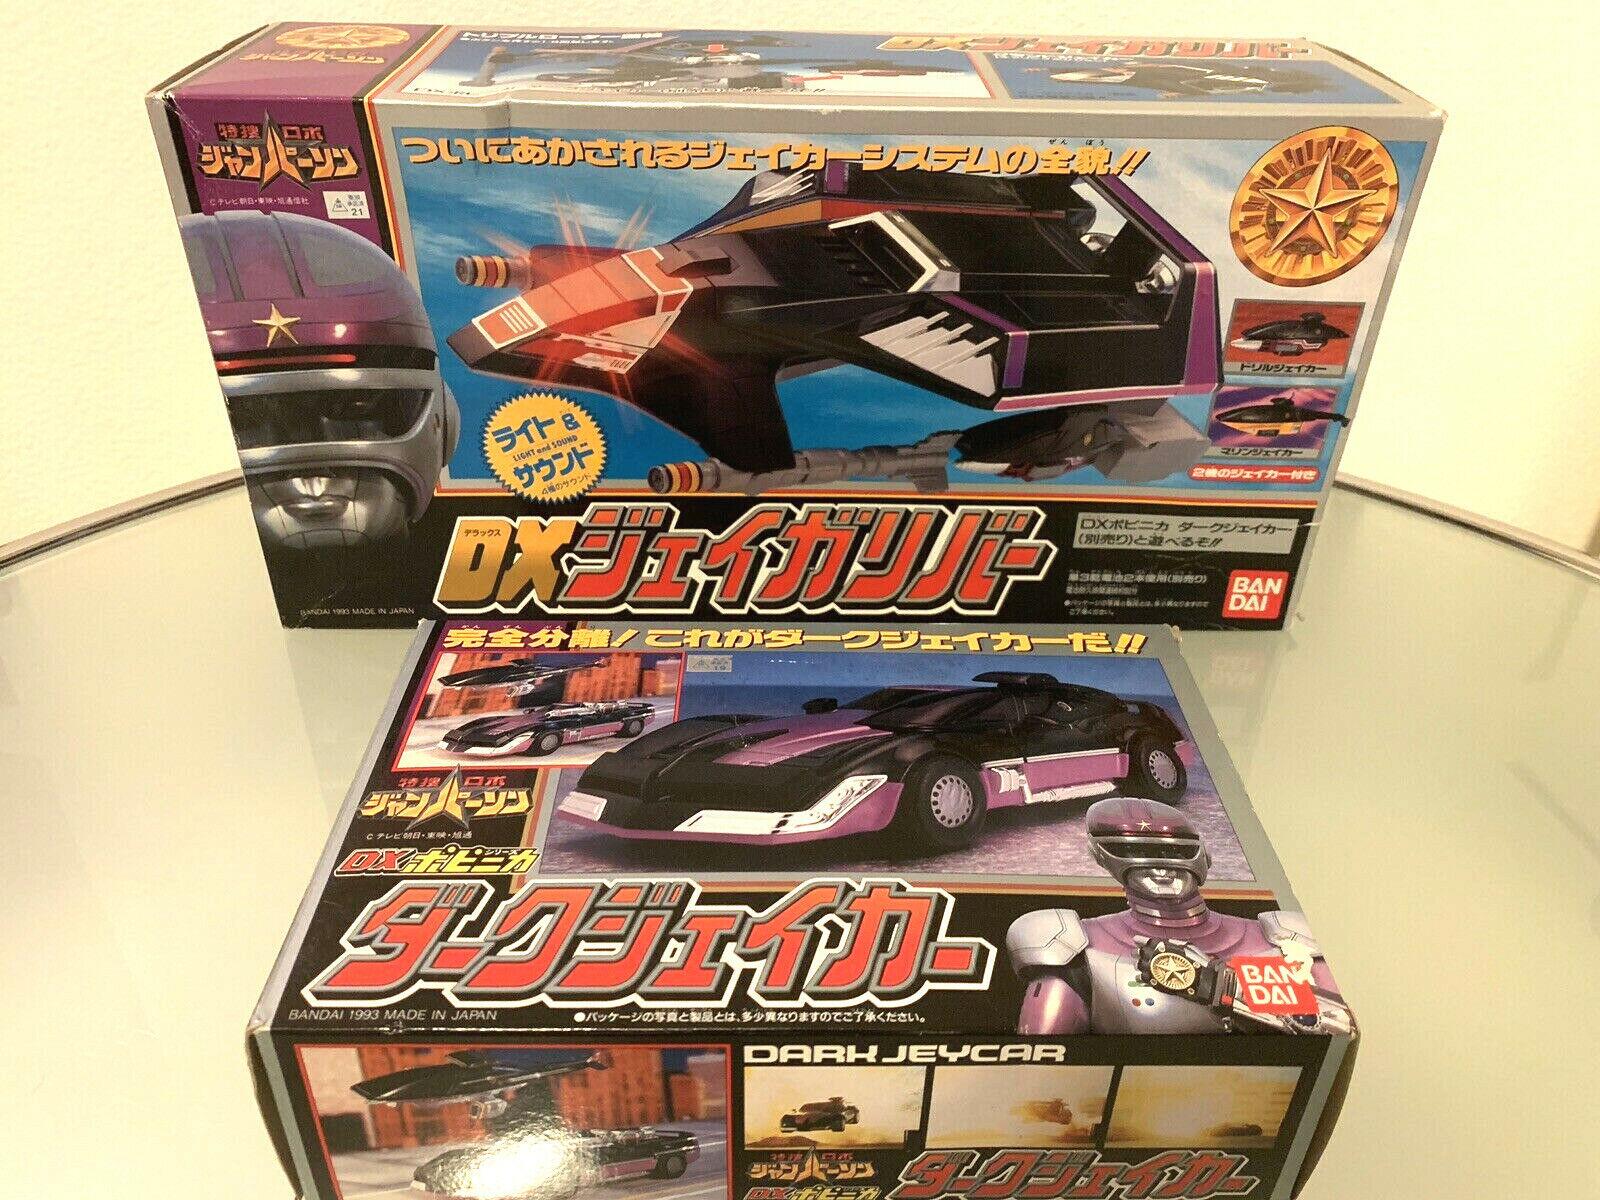 RARE Beai 1993 Sheriff Janperson DX Dark Jayauto &  DX Jet Tokusou Juspion  autentico